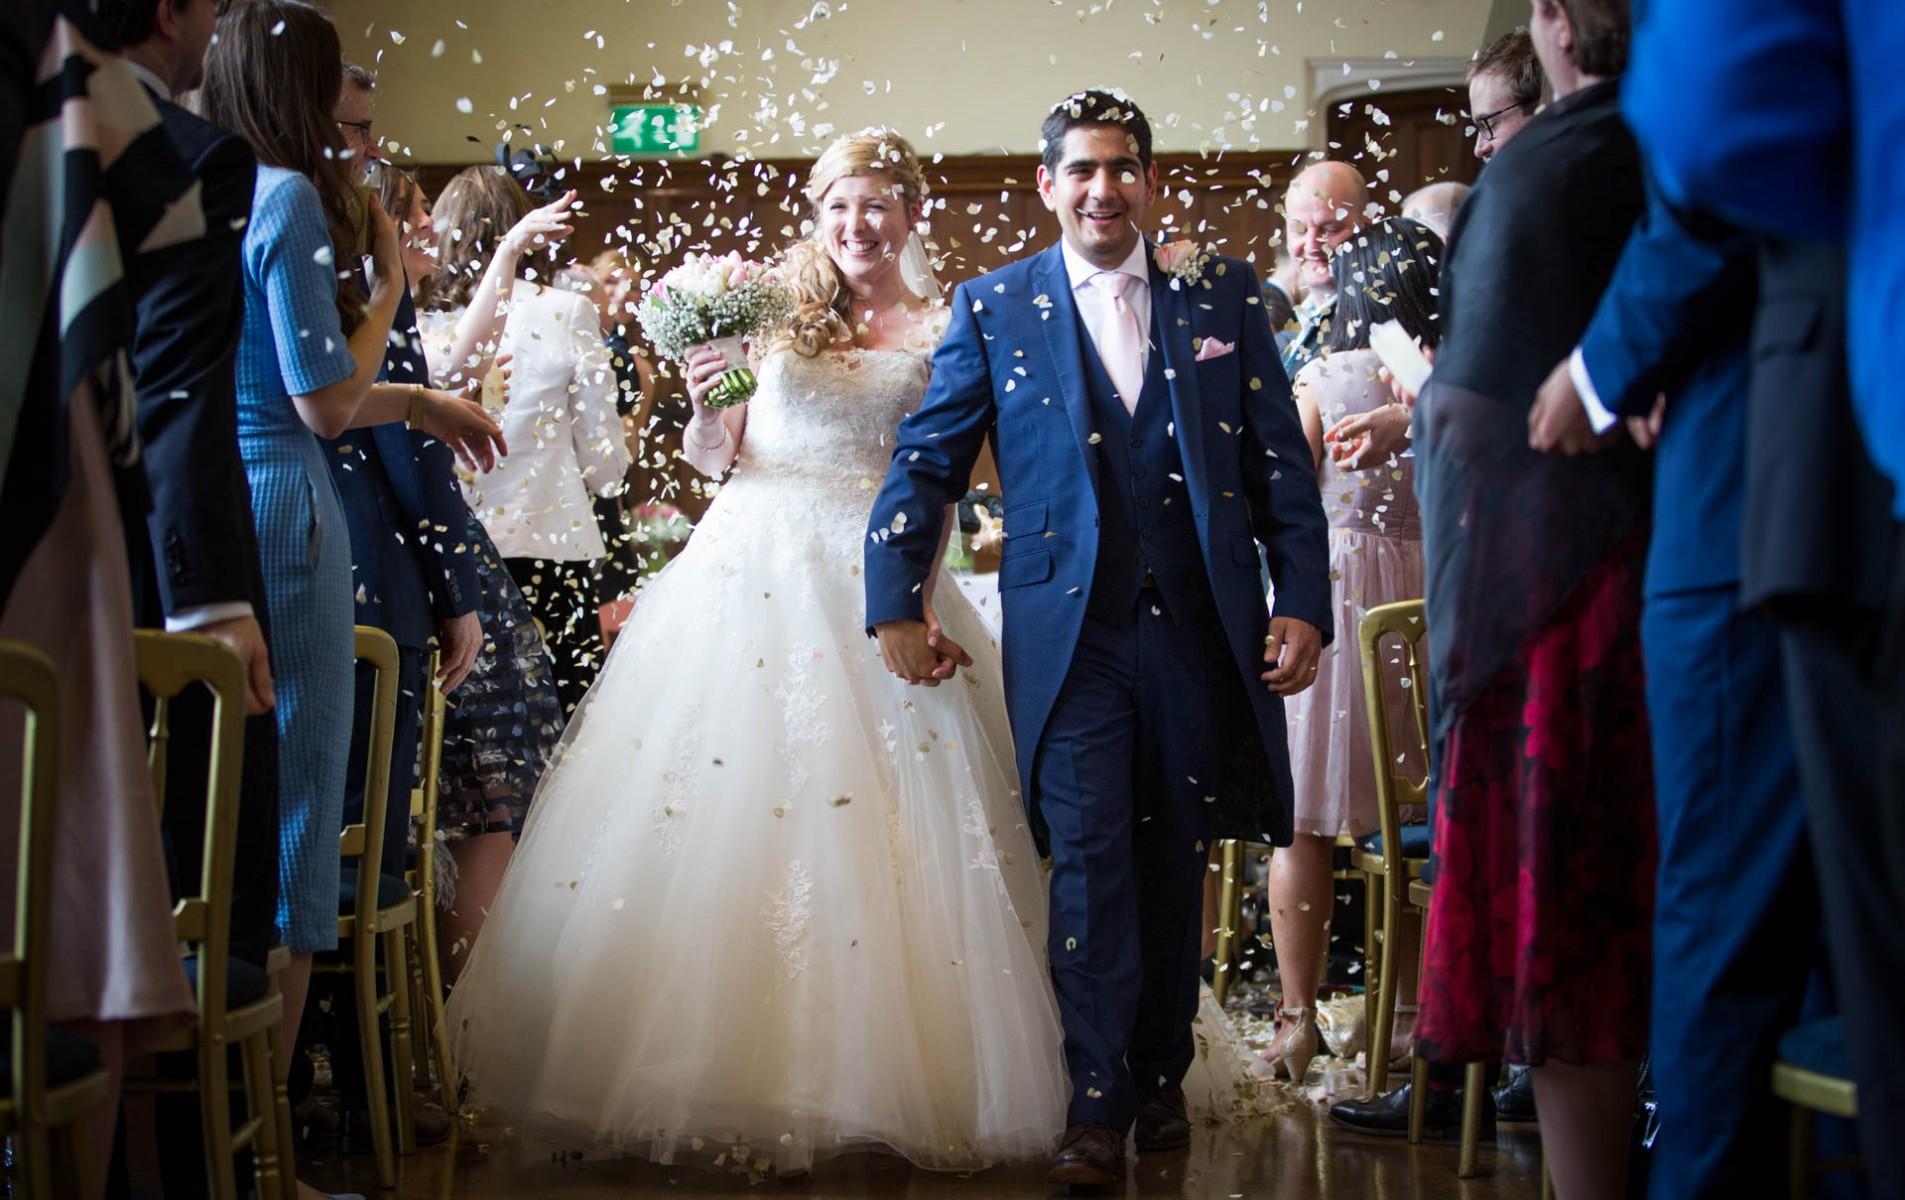 Shiplake College Wedding - Katharine and Rohan